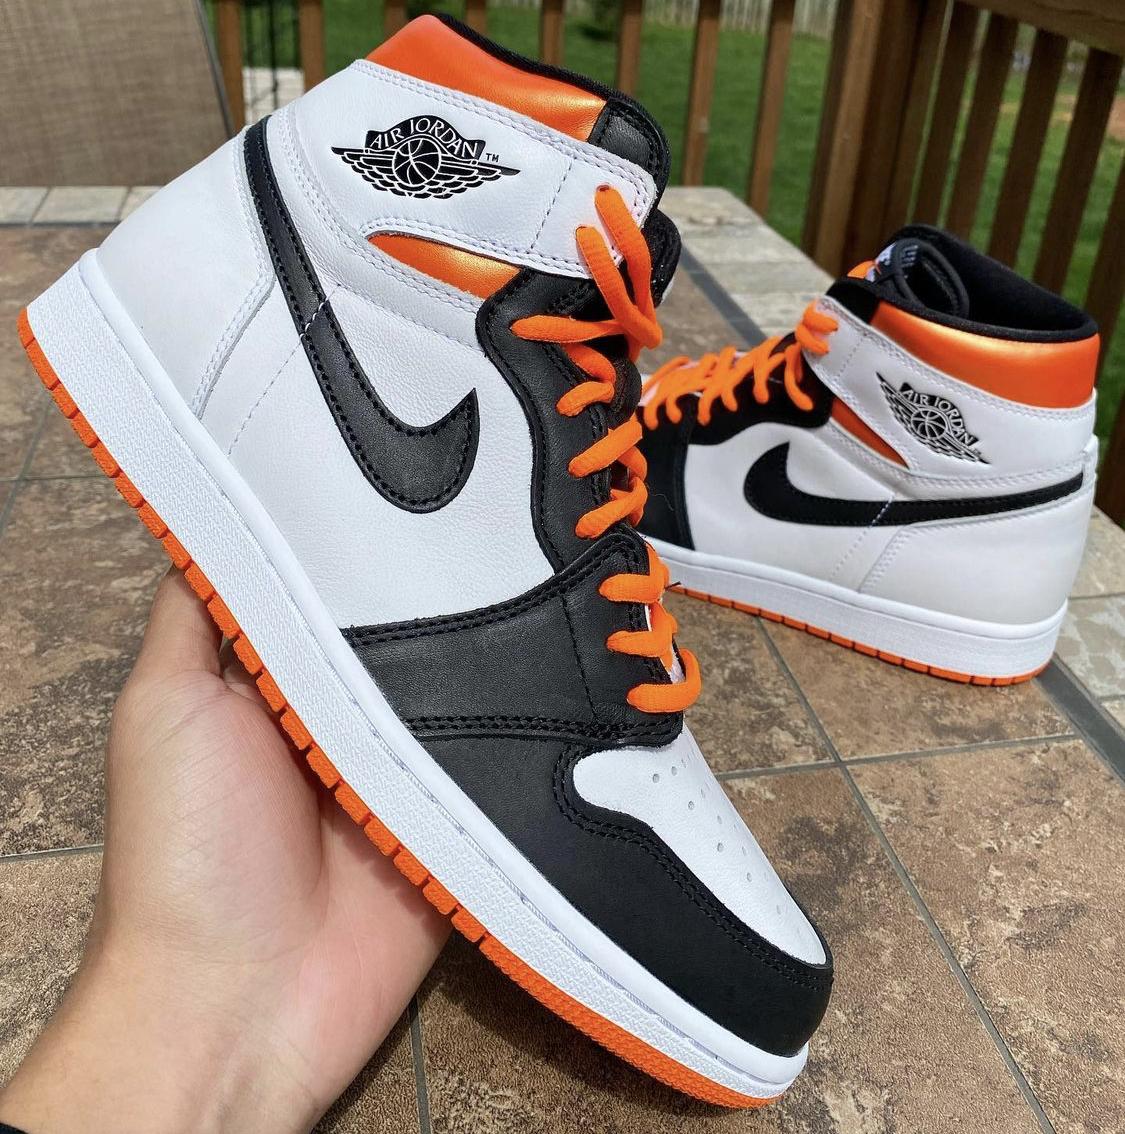 Air Jordan 1 High OG Electro Orange Dropping This Summer ...